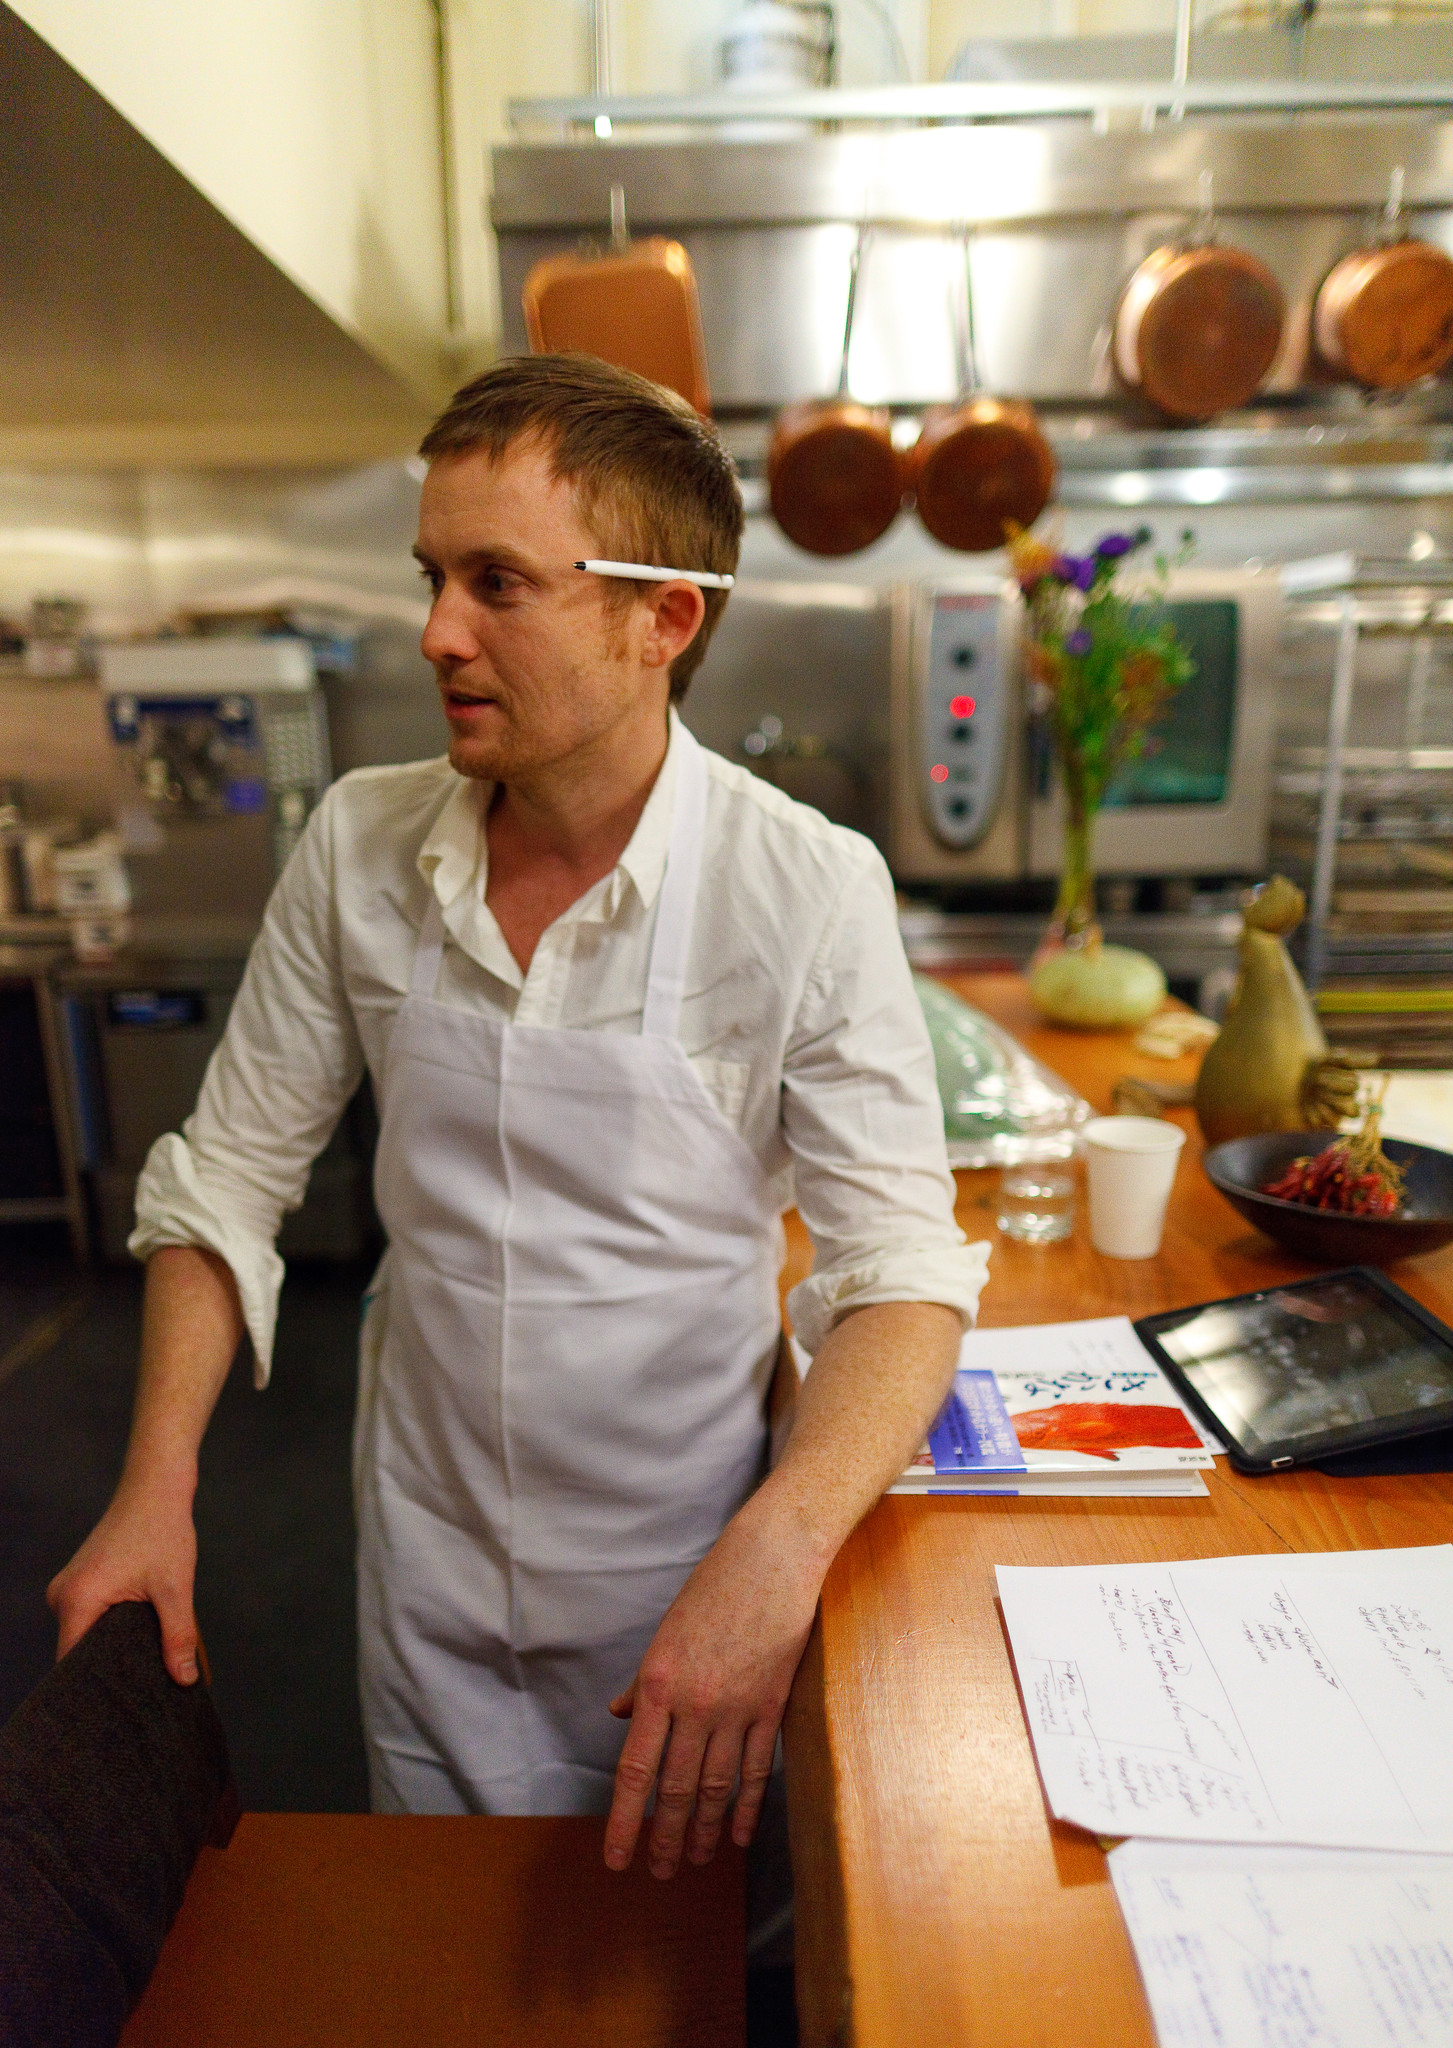 Saison-San-Francisco-Portrait-of-Chef-Joshua-Skenes-with-Sakana-fish-ID-book.jpeg